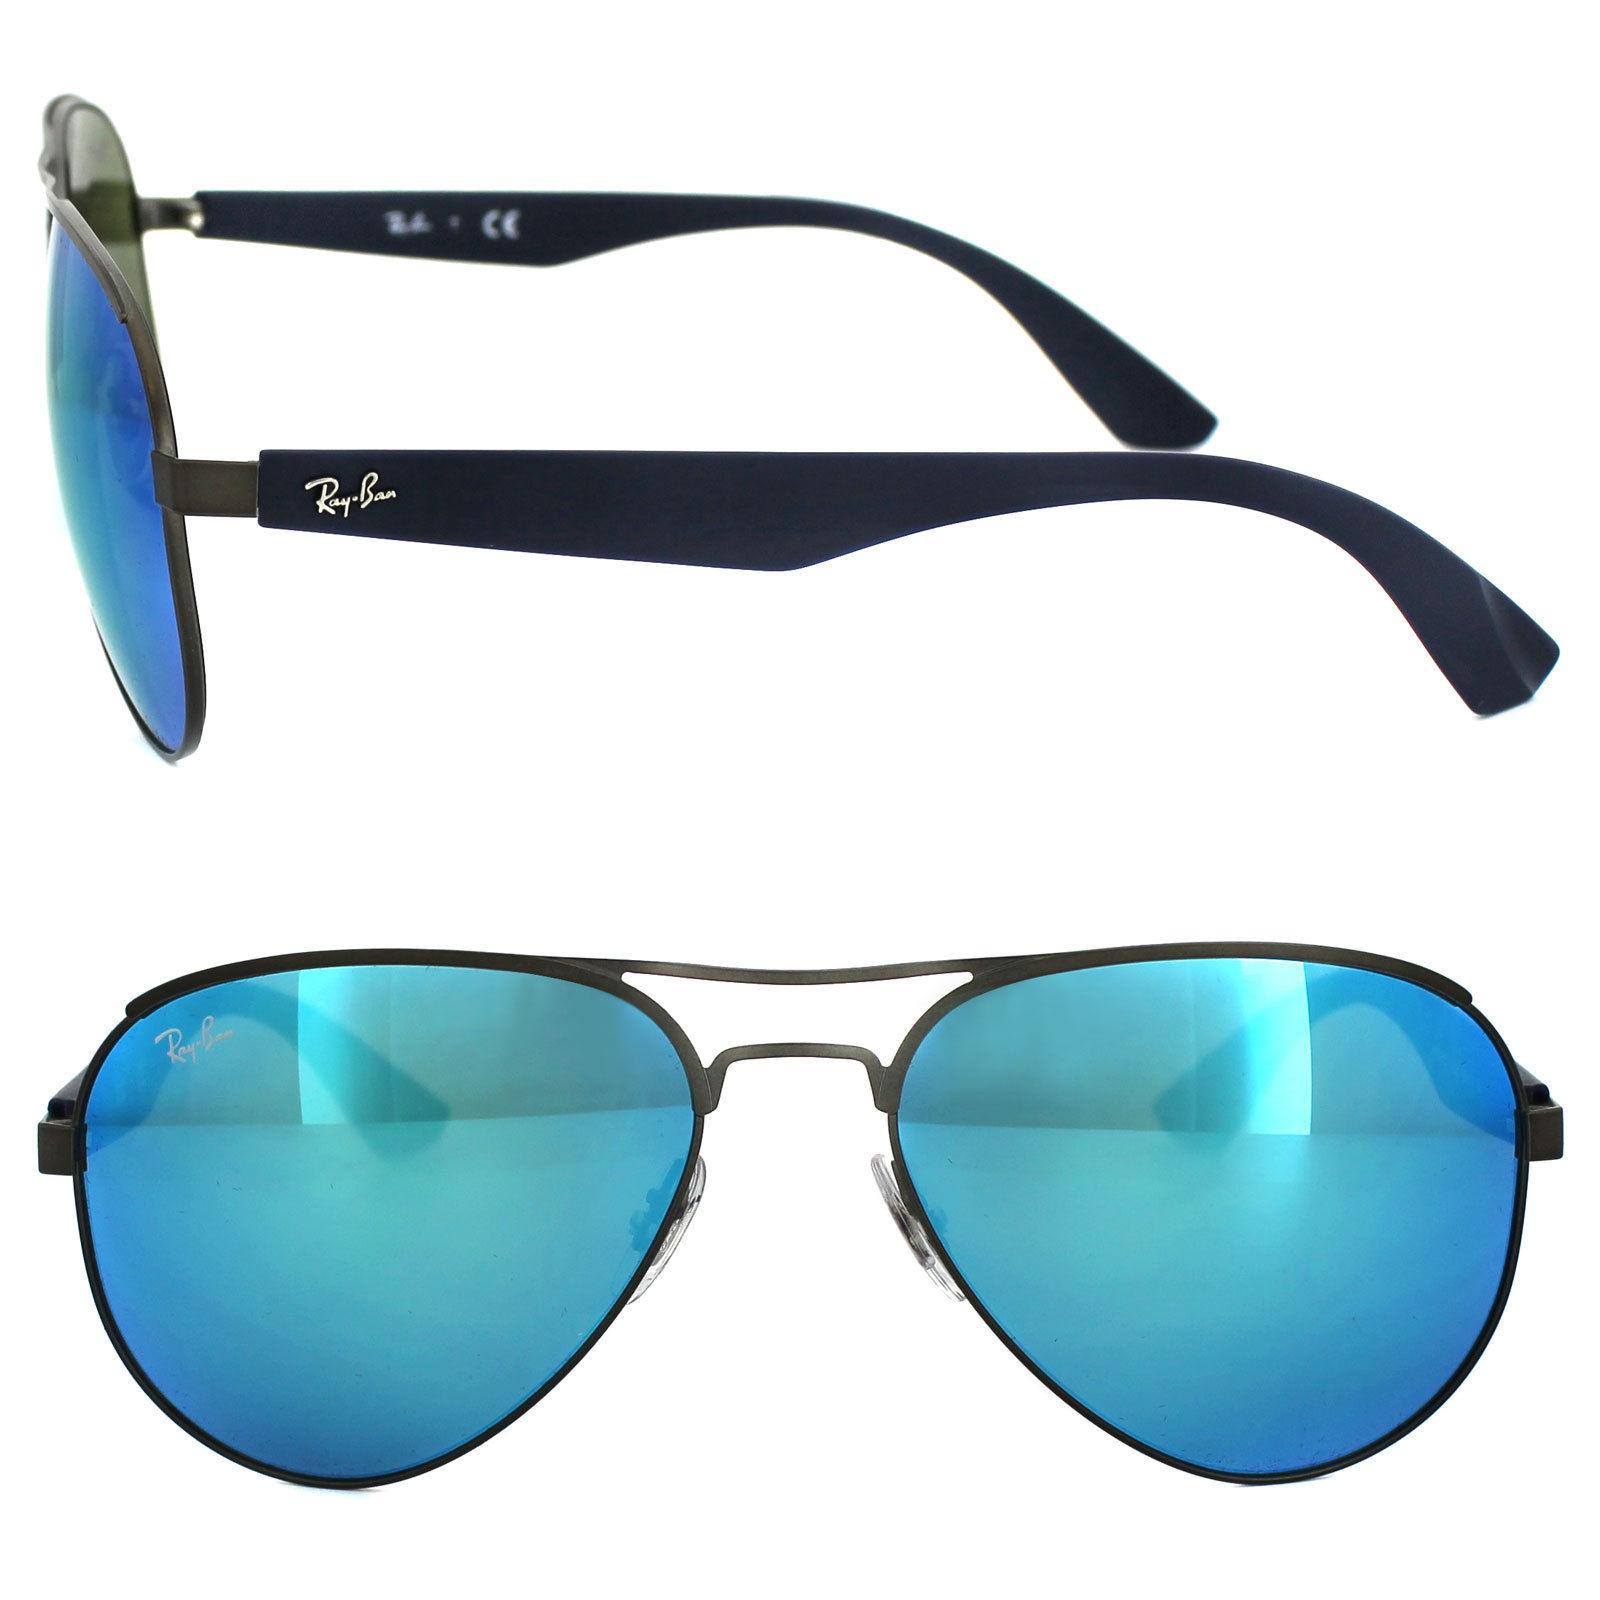 046c9b83c906c แว่นกันแดด Ray Ban RB3523 029 55 Gunmetal Blue Mirror แท้ ราคาพิเศษ ...